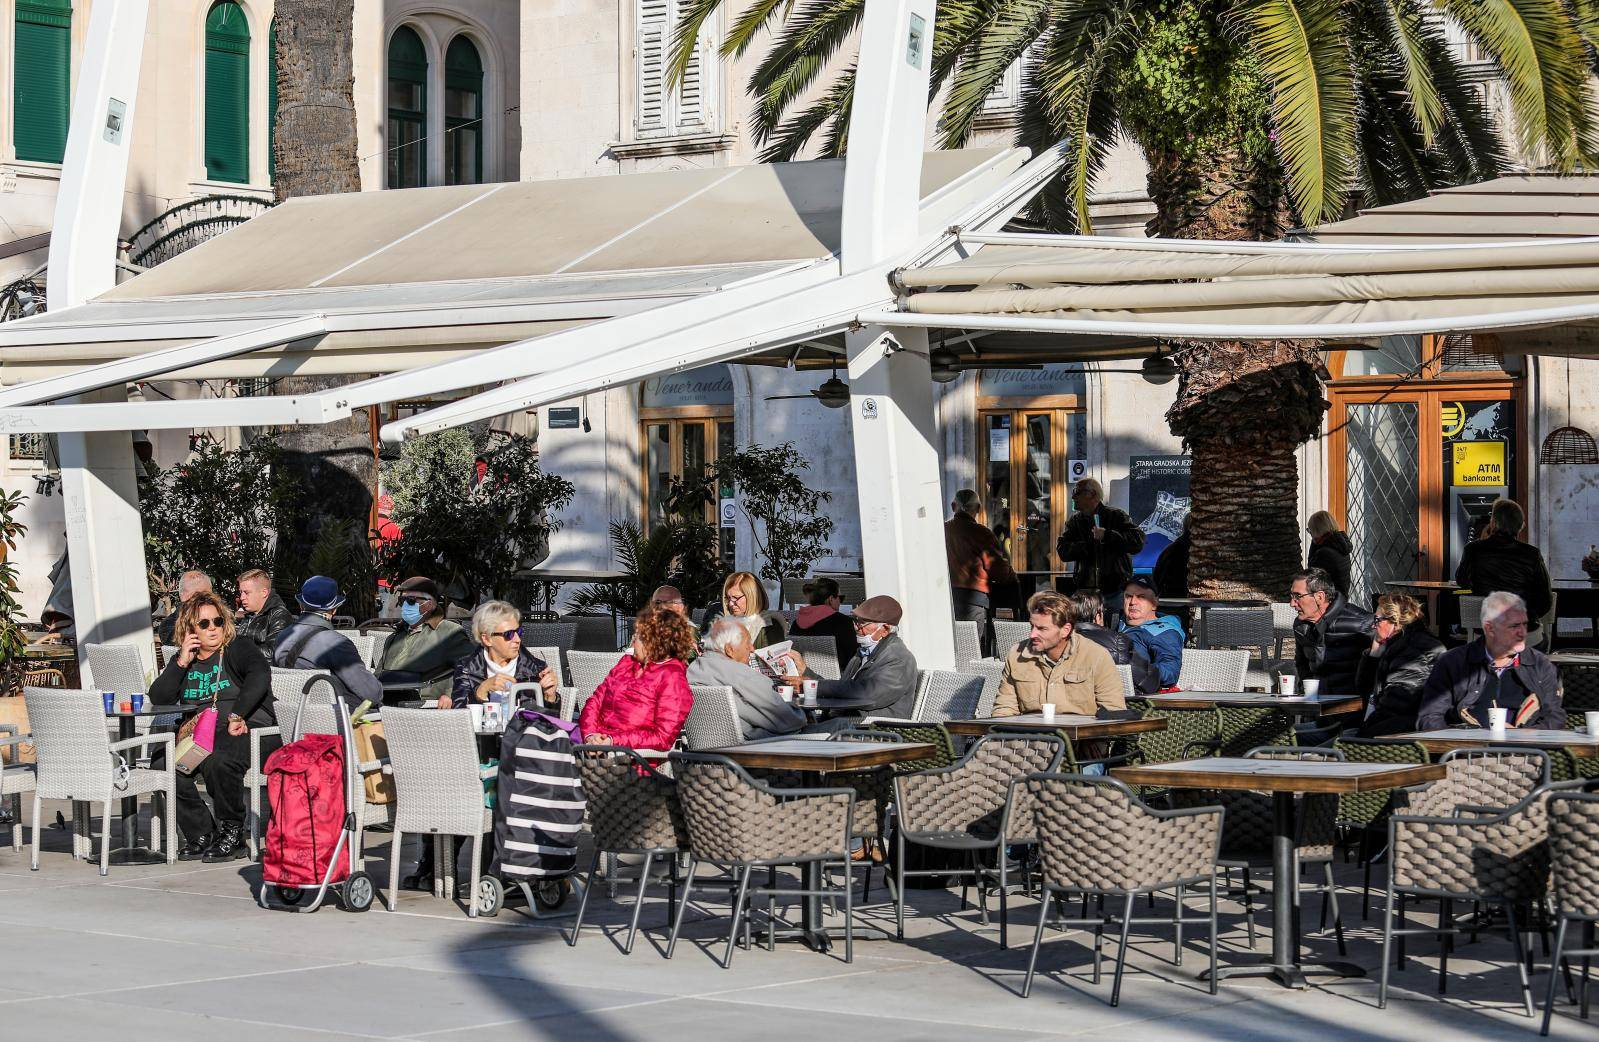 Split: Građani s kavom za van sjeli na terase zatvorenih lokala i uživali na suncu